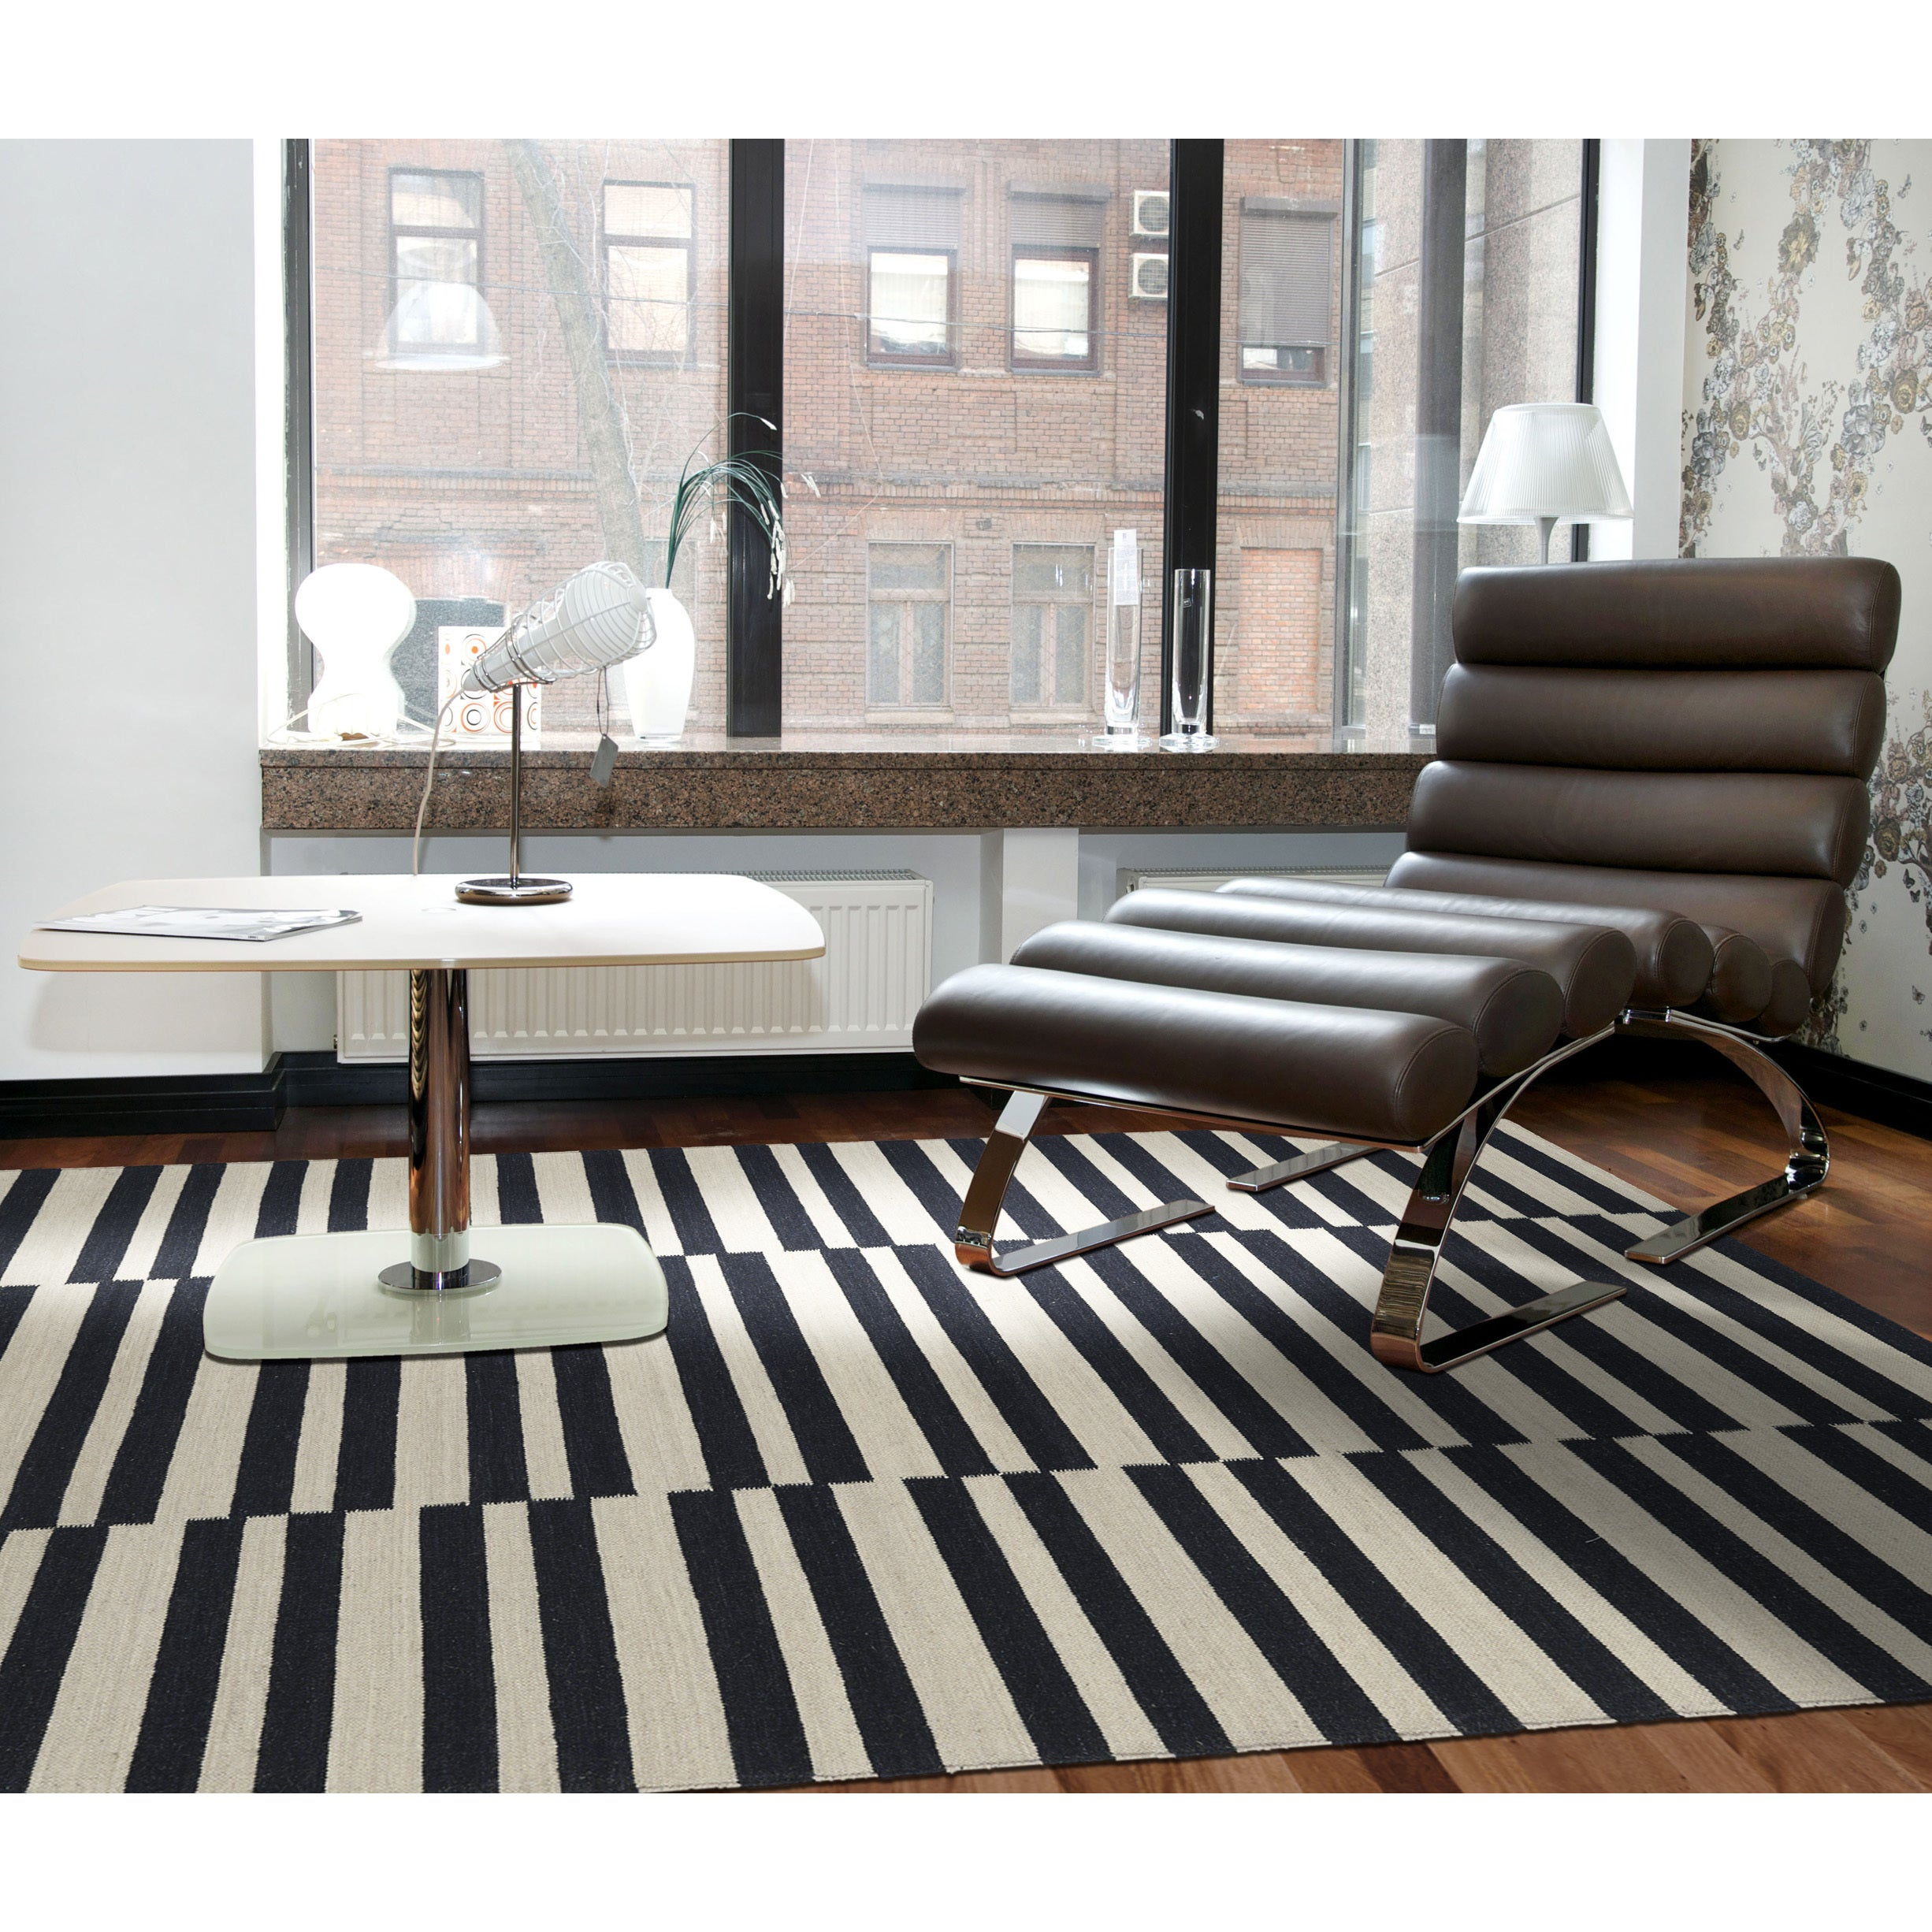 Flatweave TriBeCa Black Stripes Wool Rug 8 x 10 Free